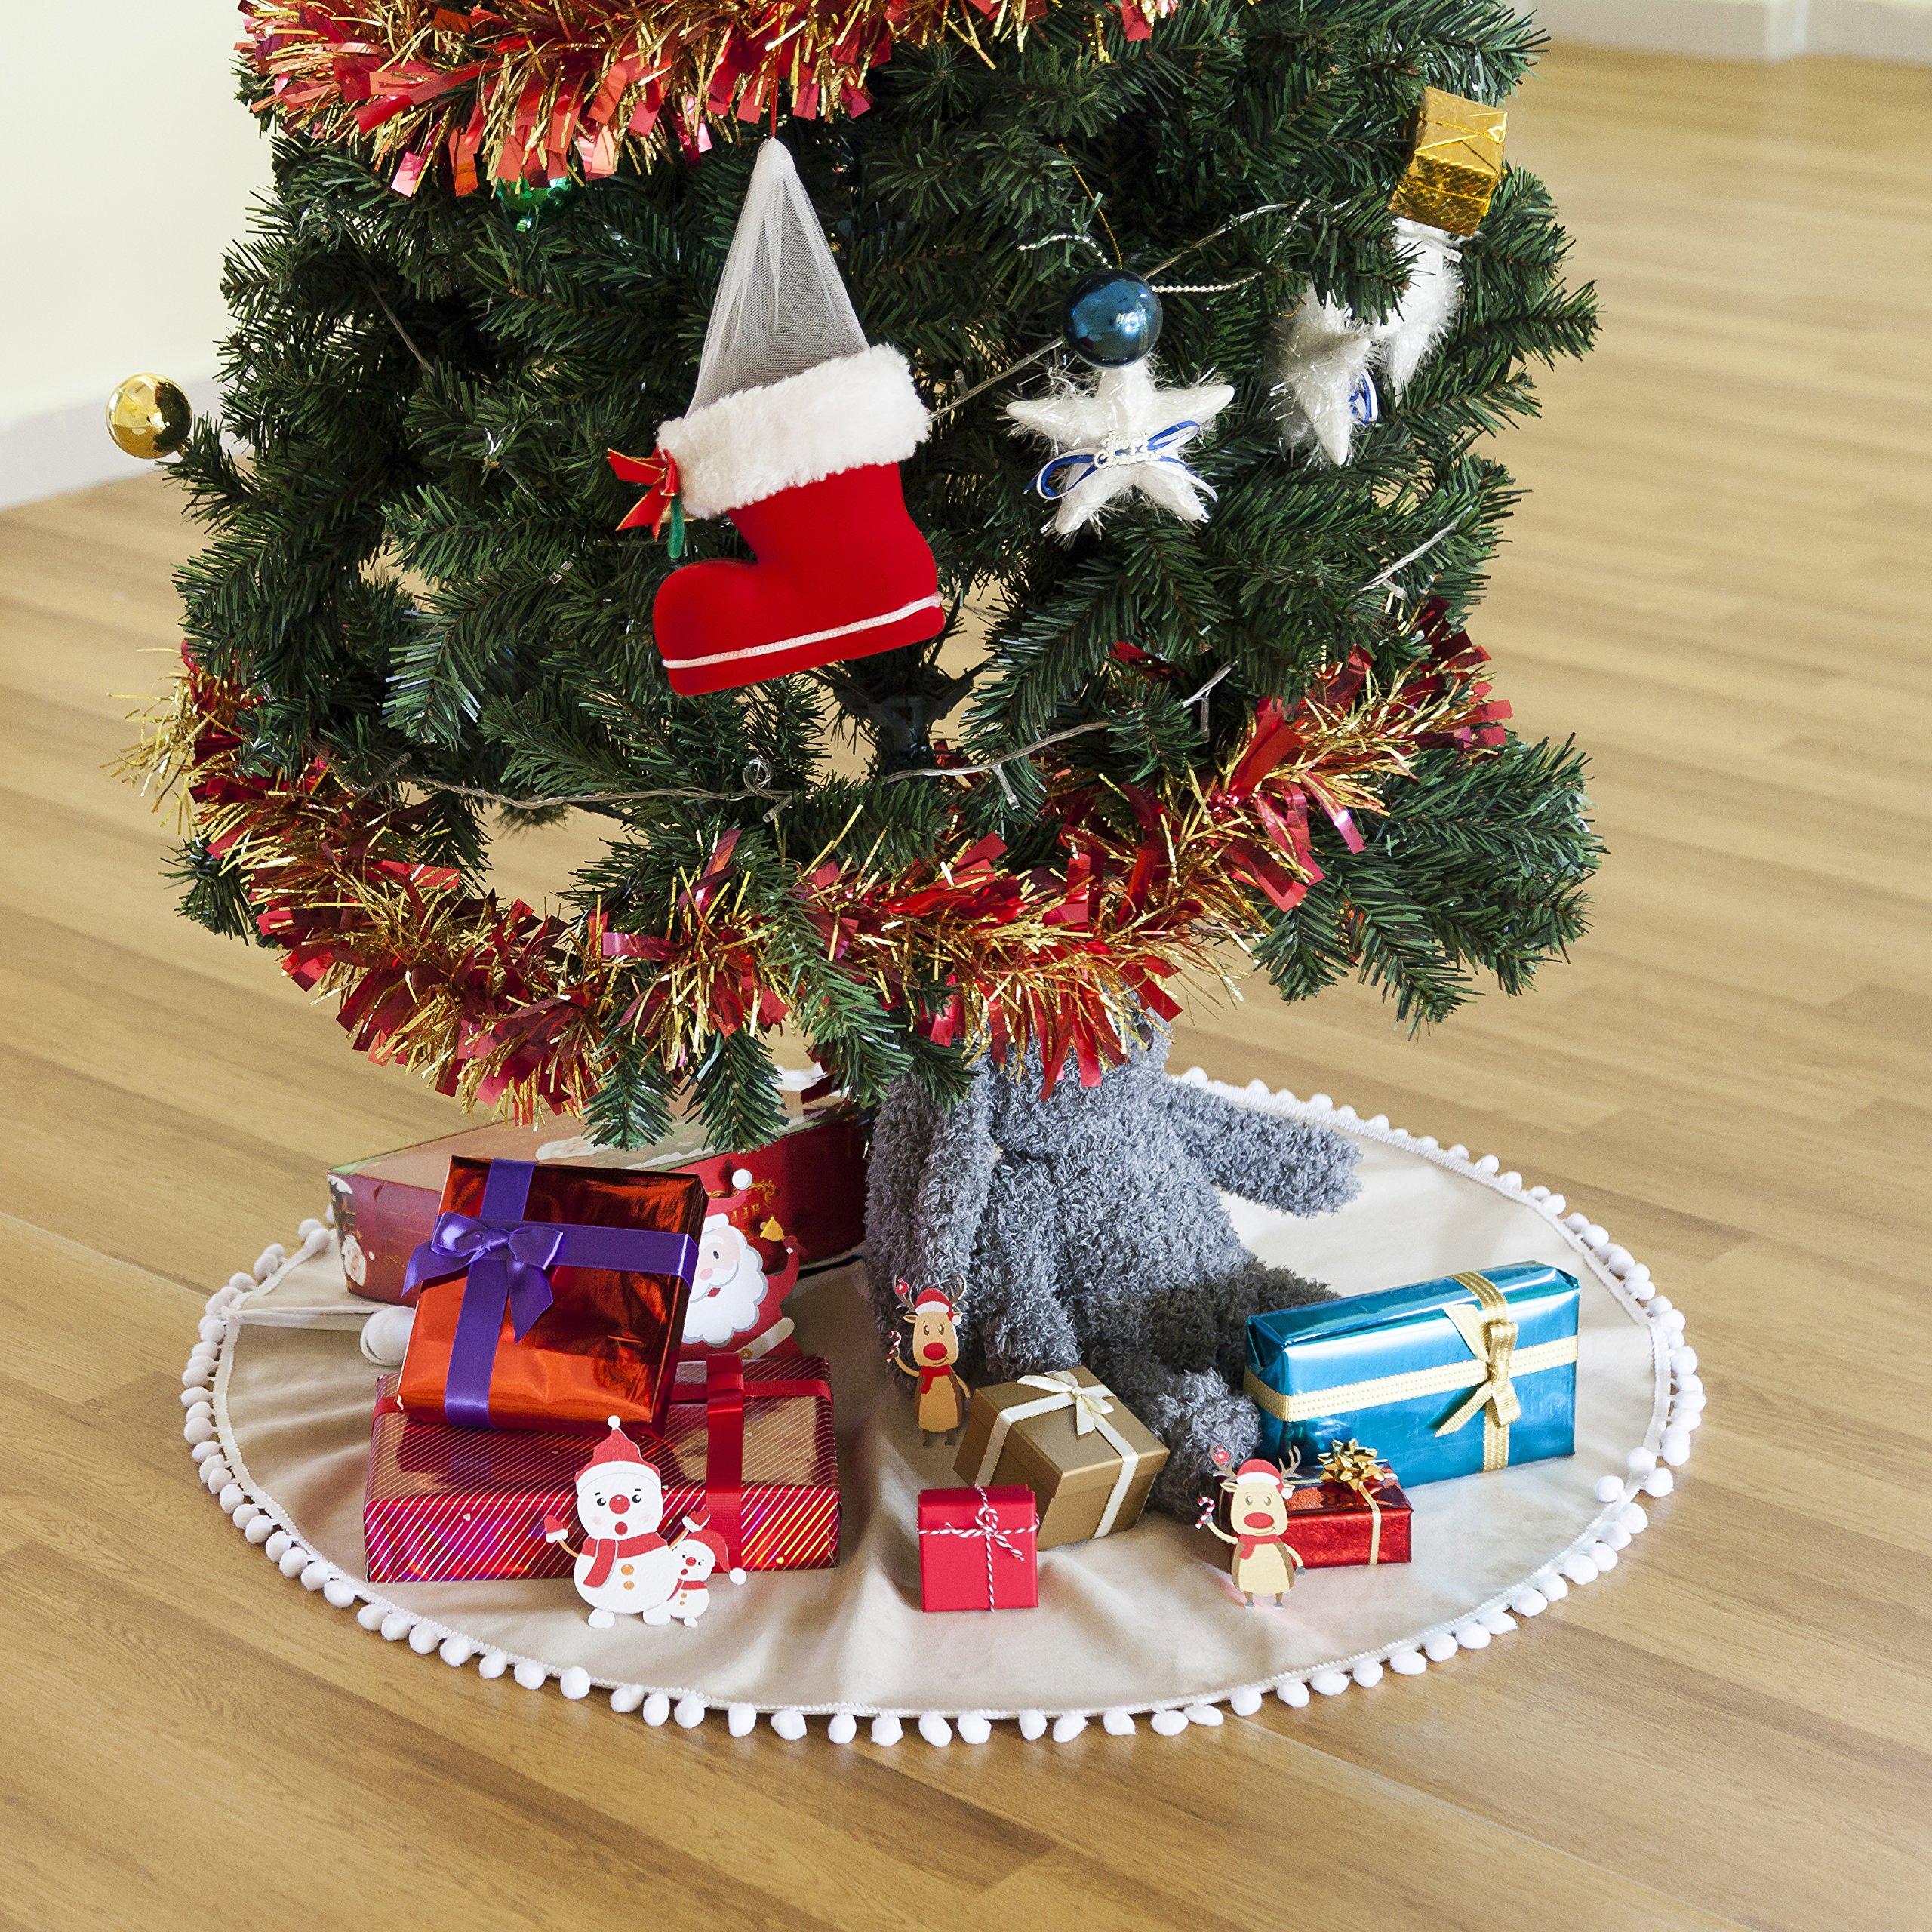 Hffls Christmas Tree Skirt 36 Inch Light brown Short velvet with snow white Pompom Tree Skirt Christmas Decorations Indoor Outdoor